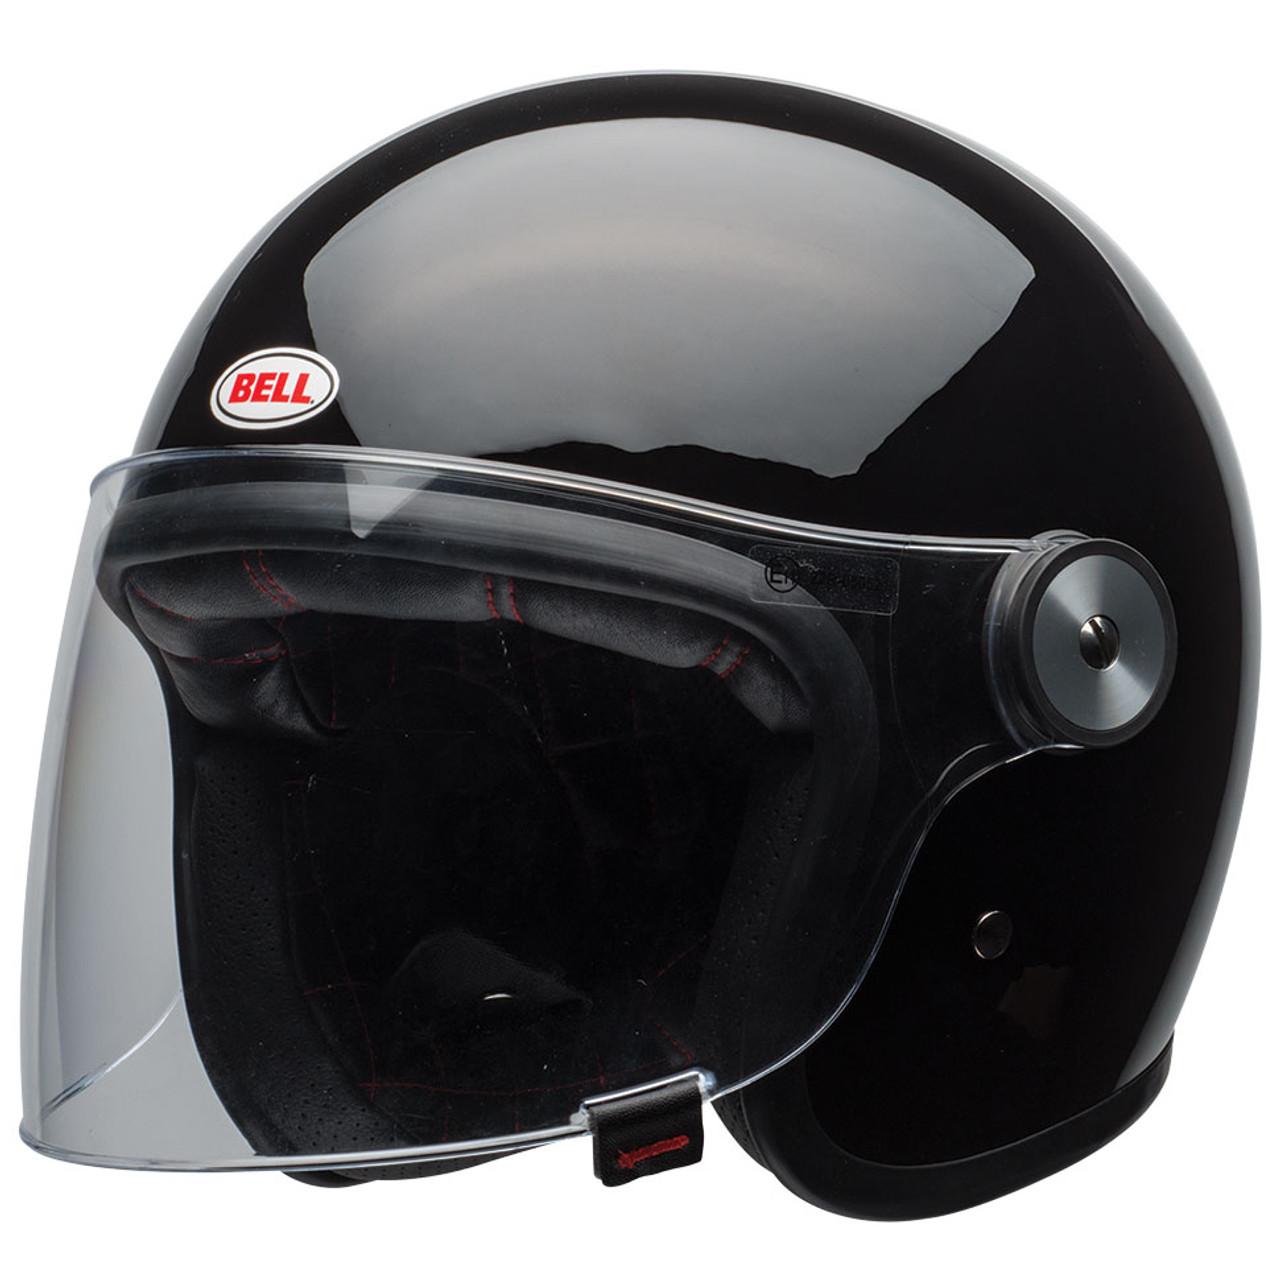 Bell Motorcycle Helmet >> Bell Riot Helmet Gloss Black